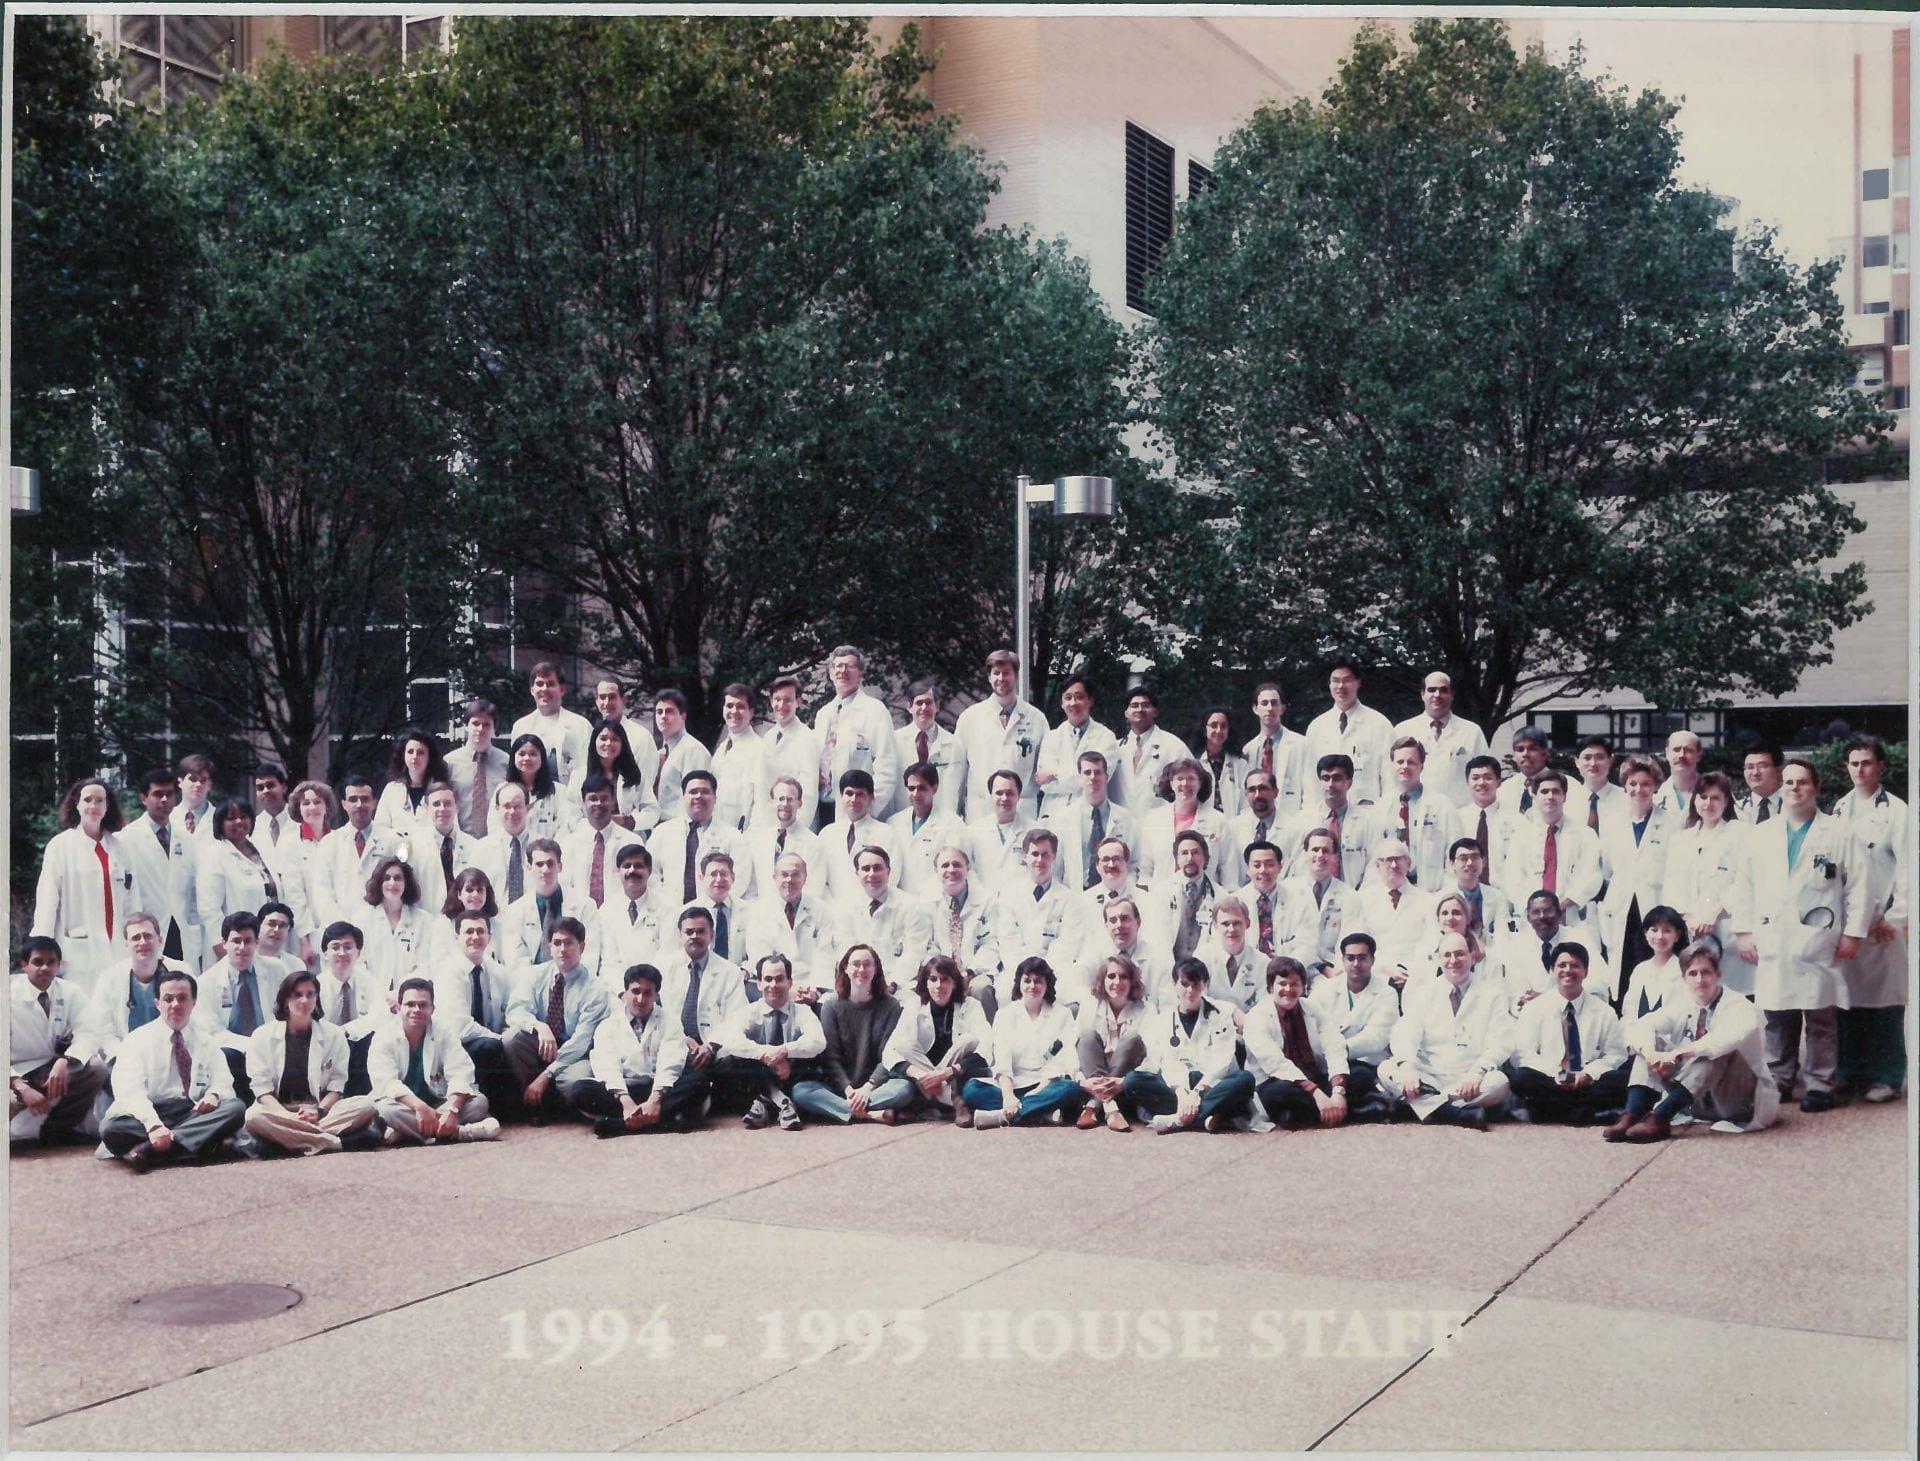 1994 Housestaff Photo